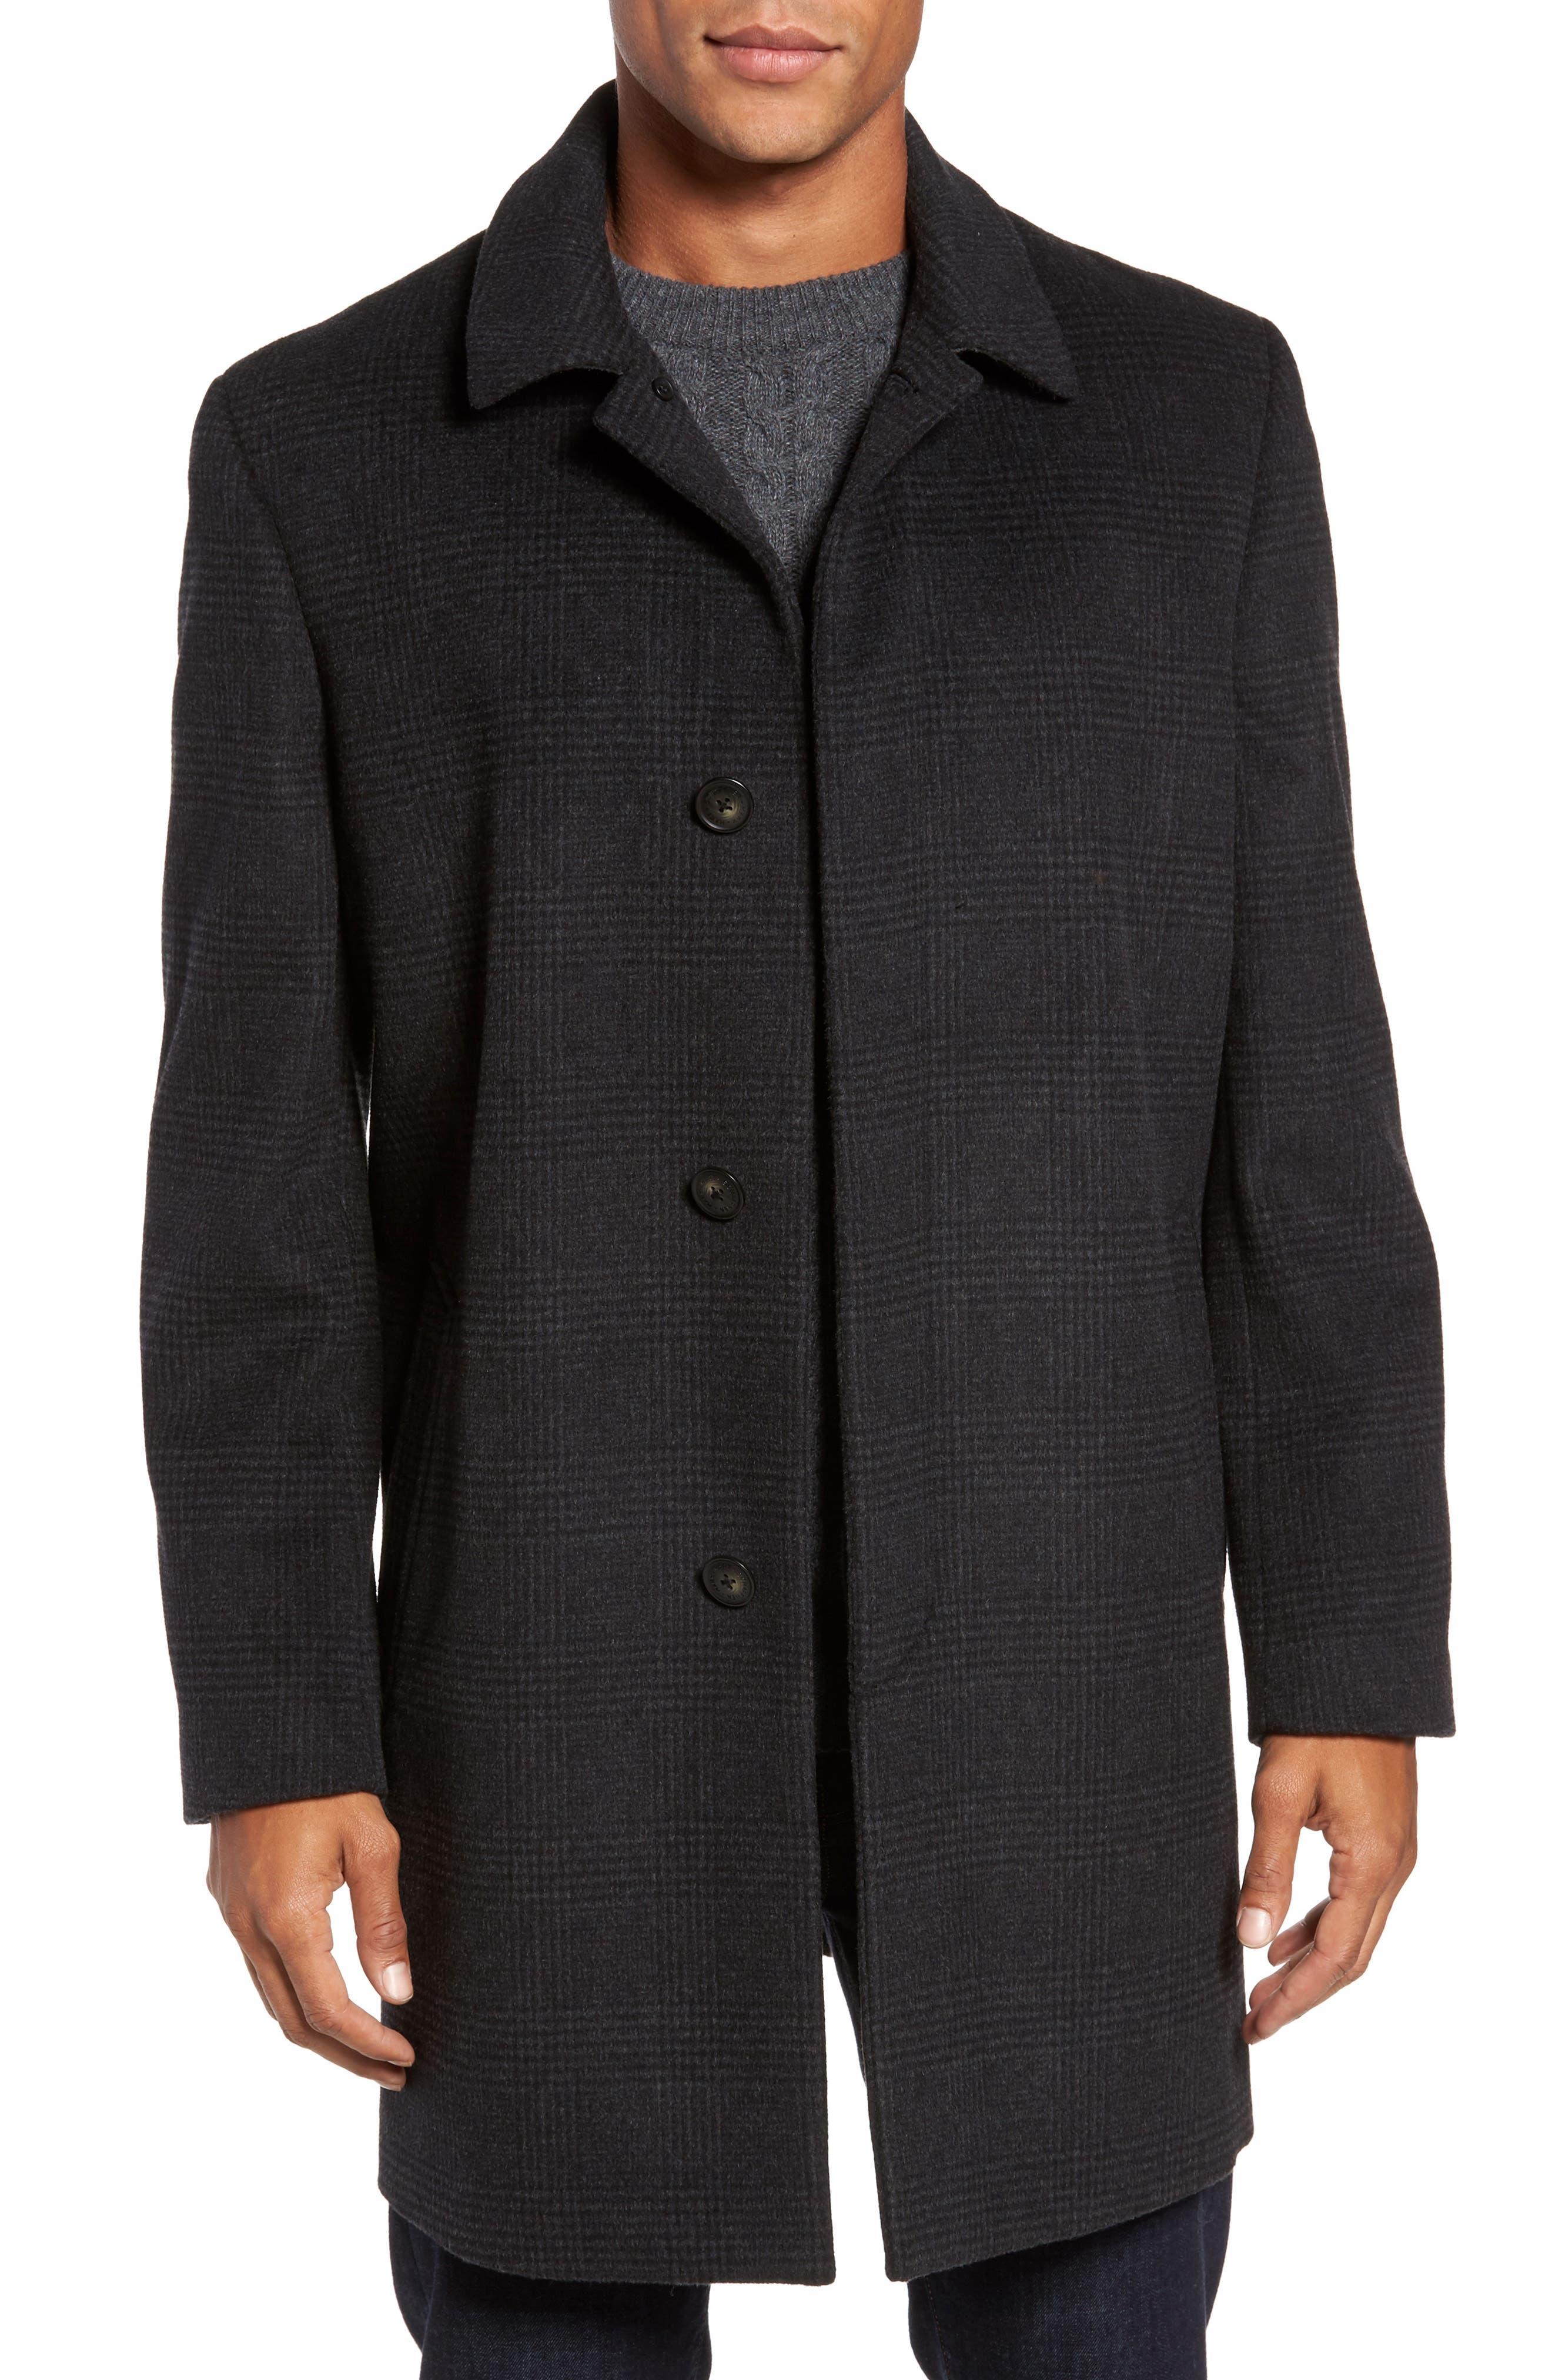 Turner Plaid Wool Blend Topcoat,                         Main,                         color, Dark Charcoal